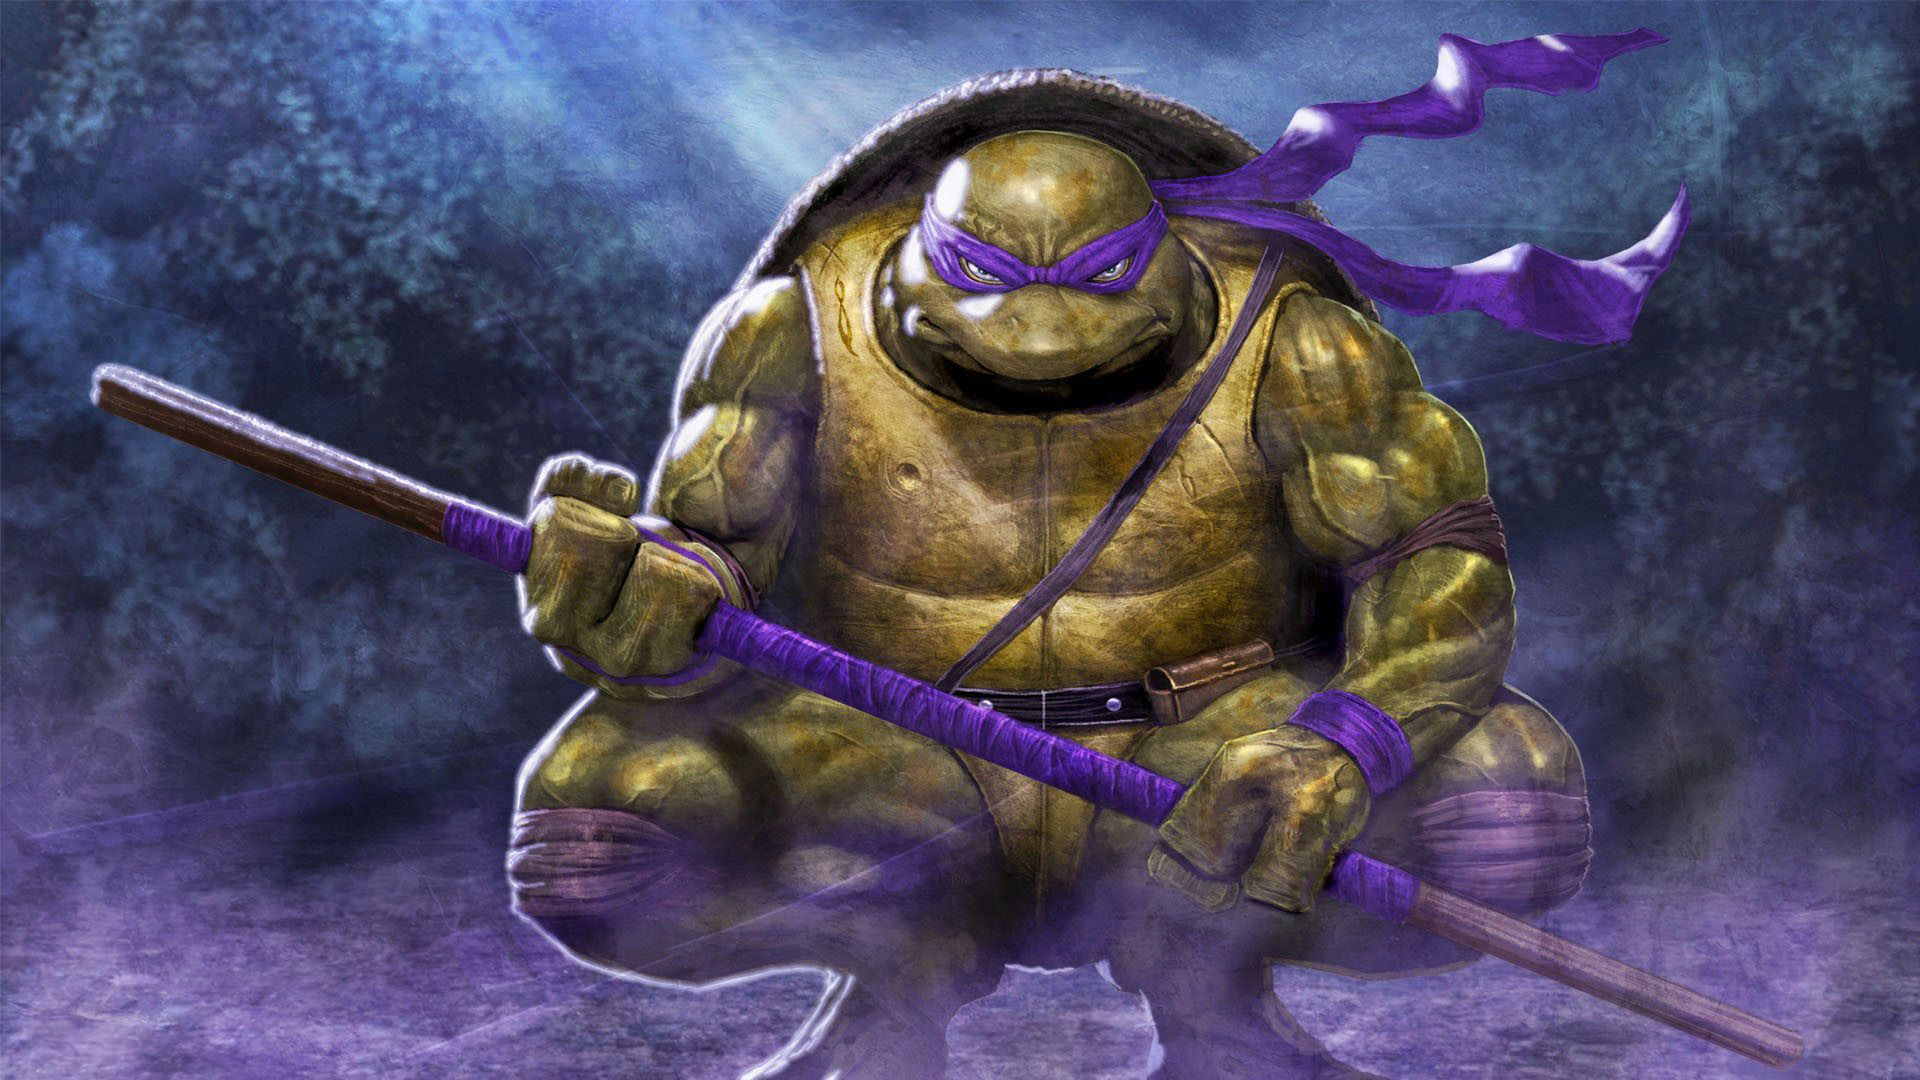 Donatello Teenage Mutant Ninja Turtles Hd Wallpapers With Images